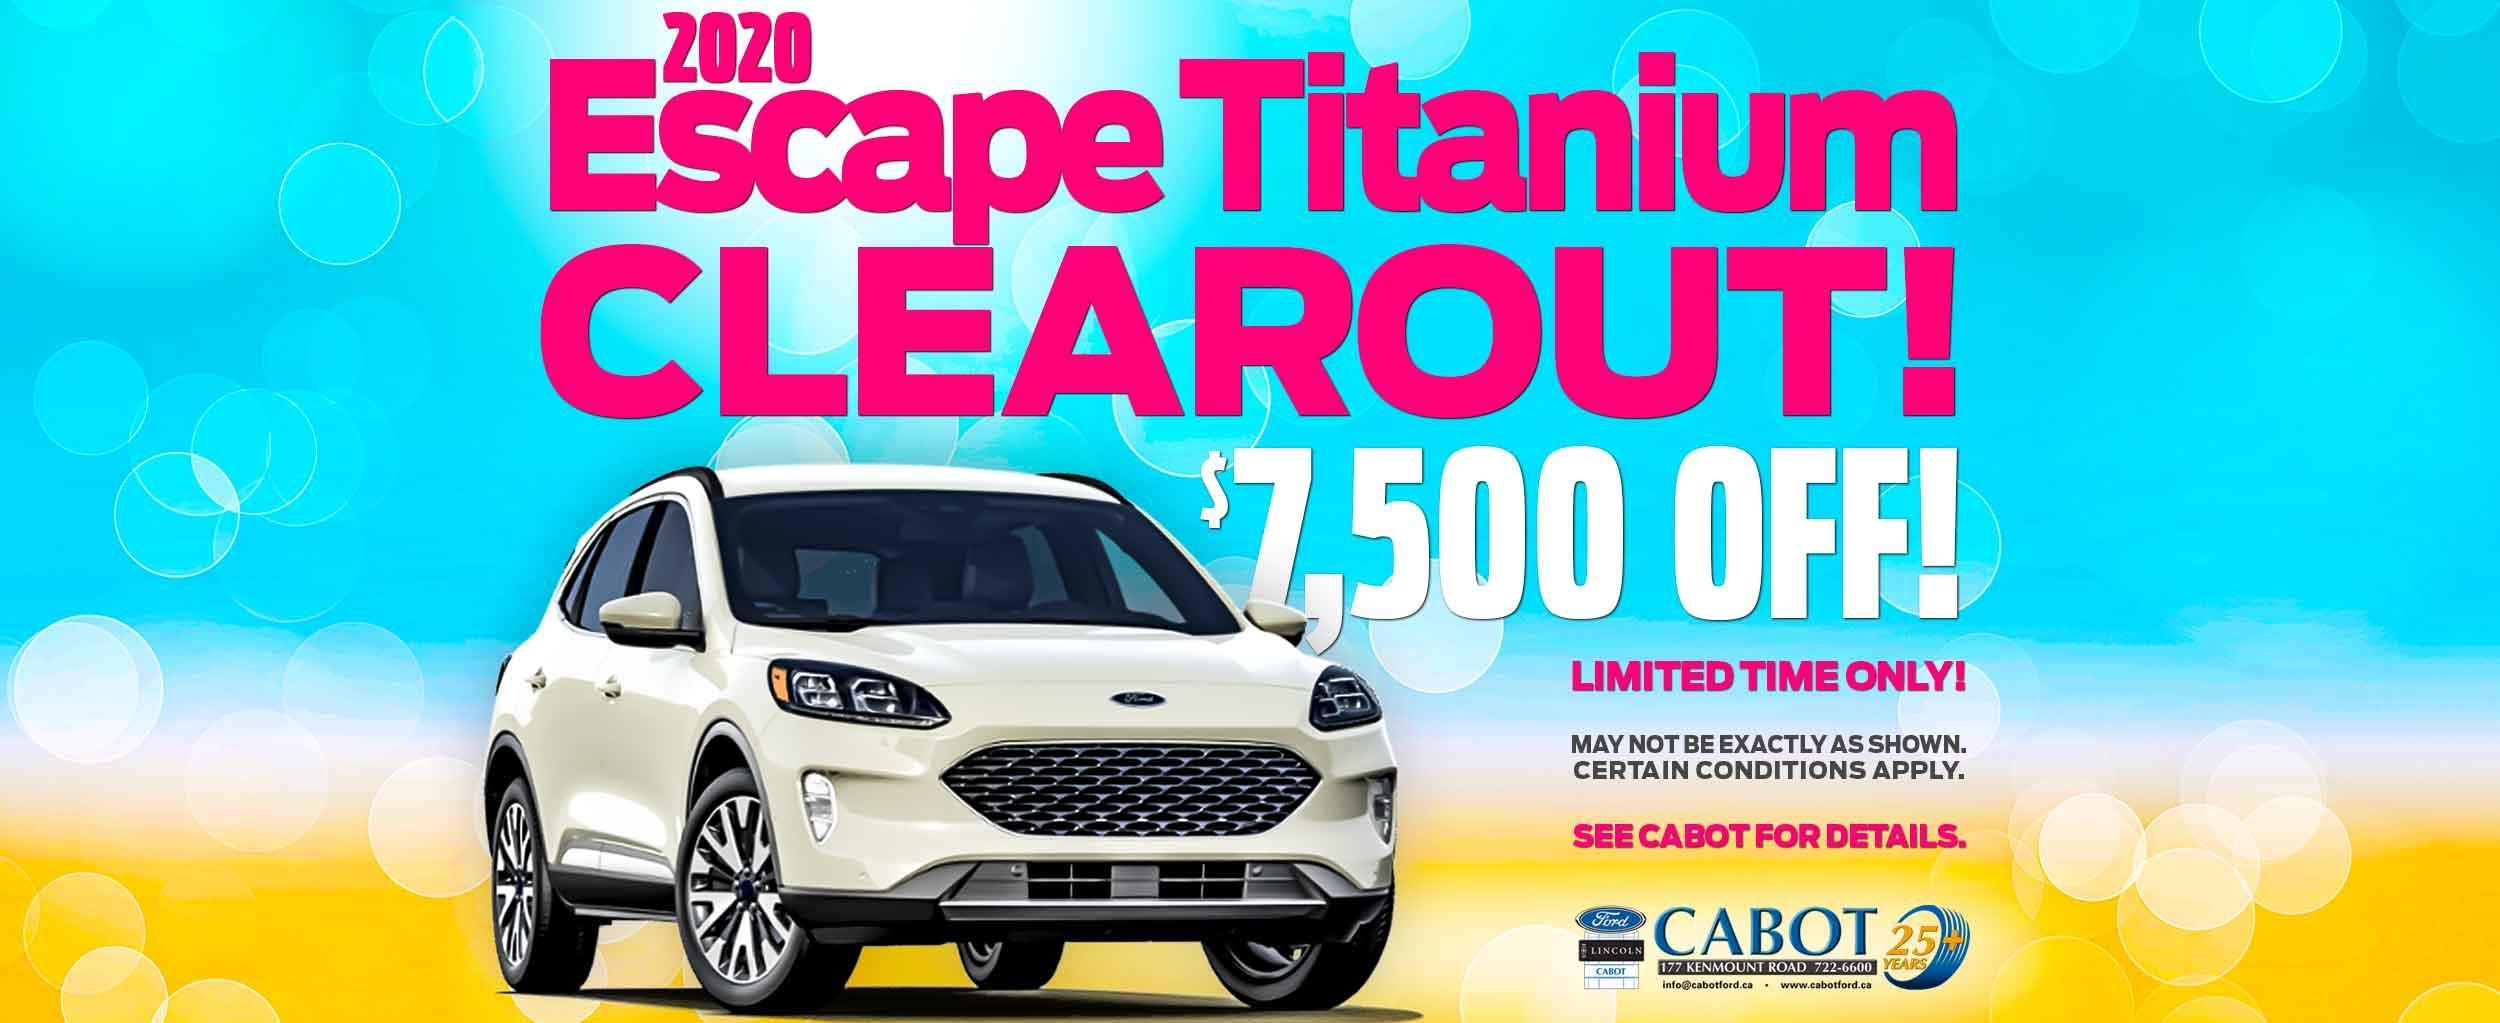 GET $7,500 OFF THE 2020 FORD ESCAPE TITANIUM!